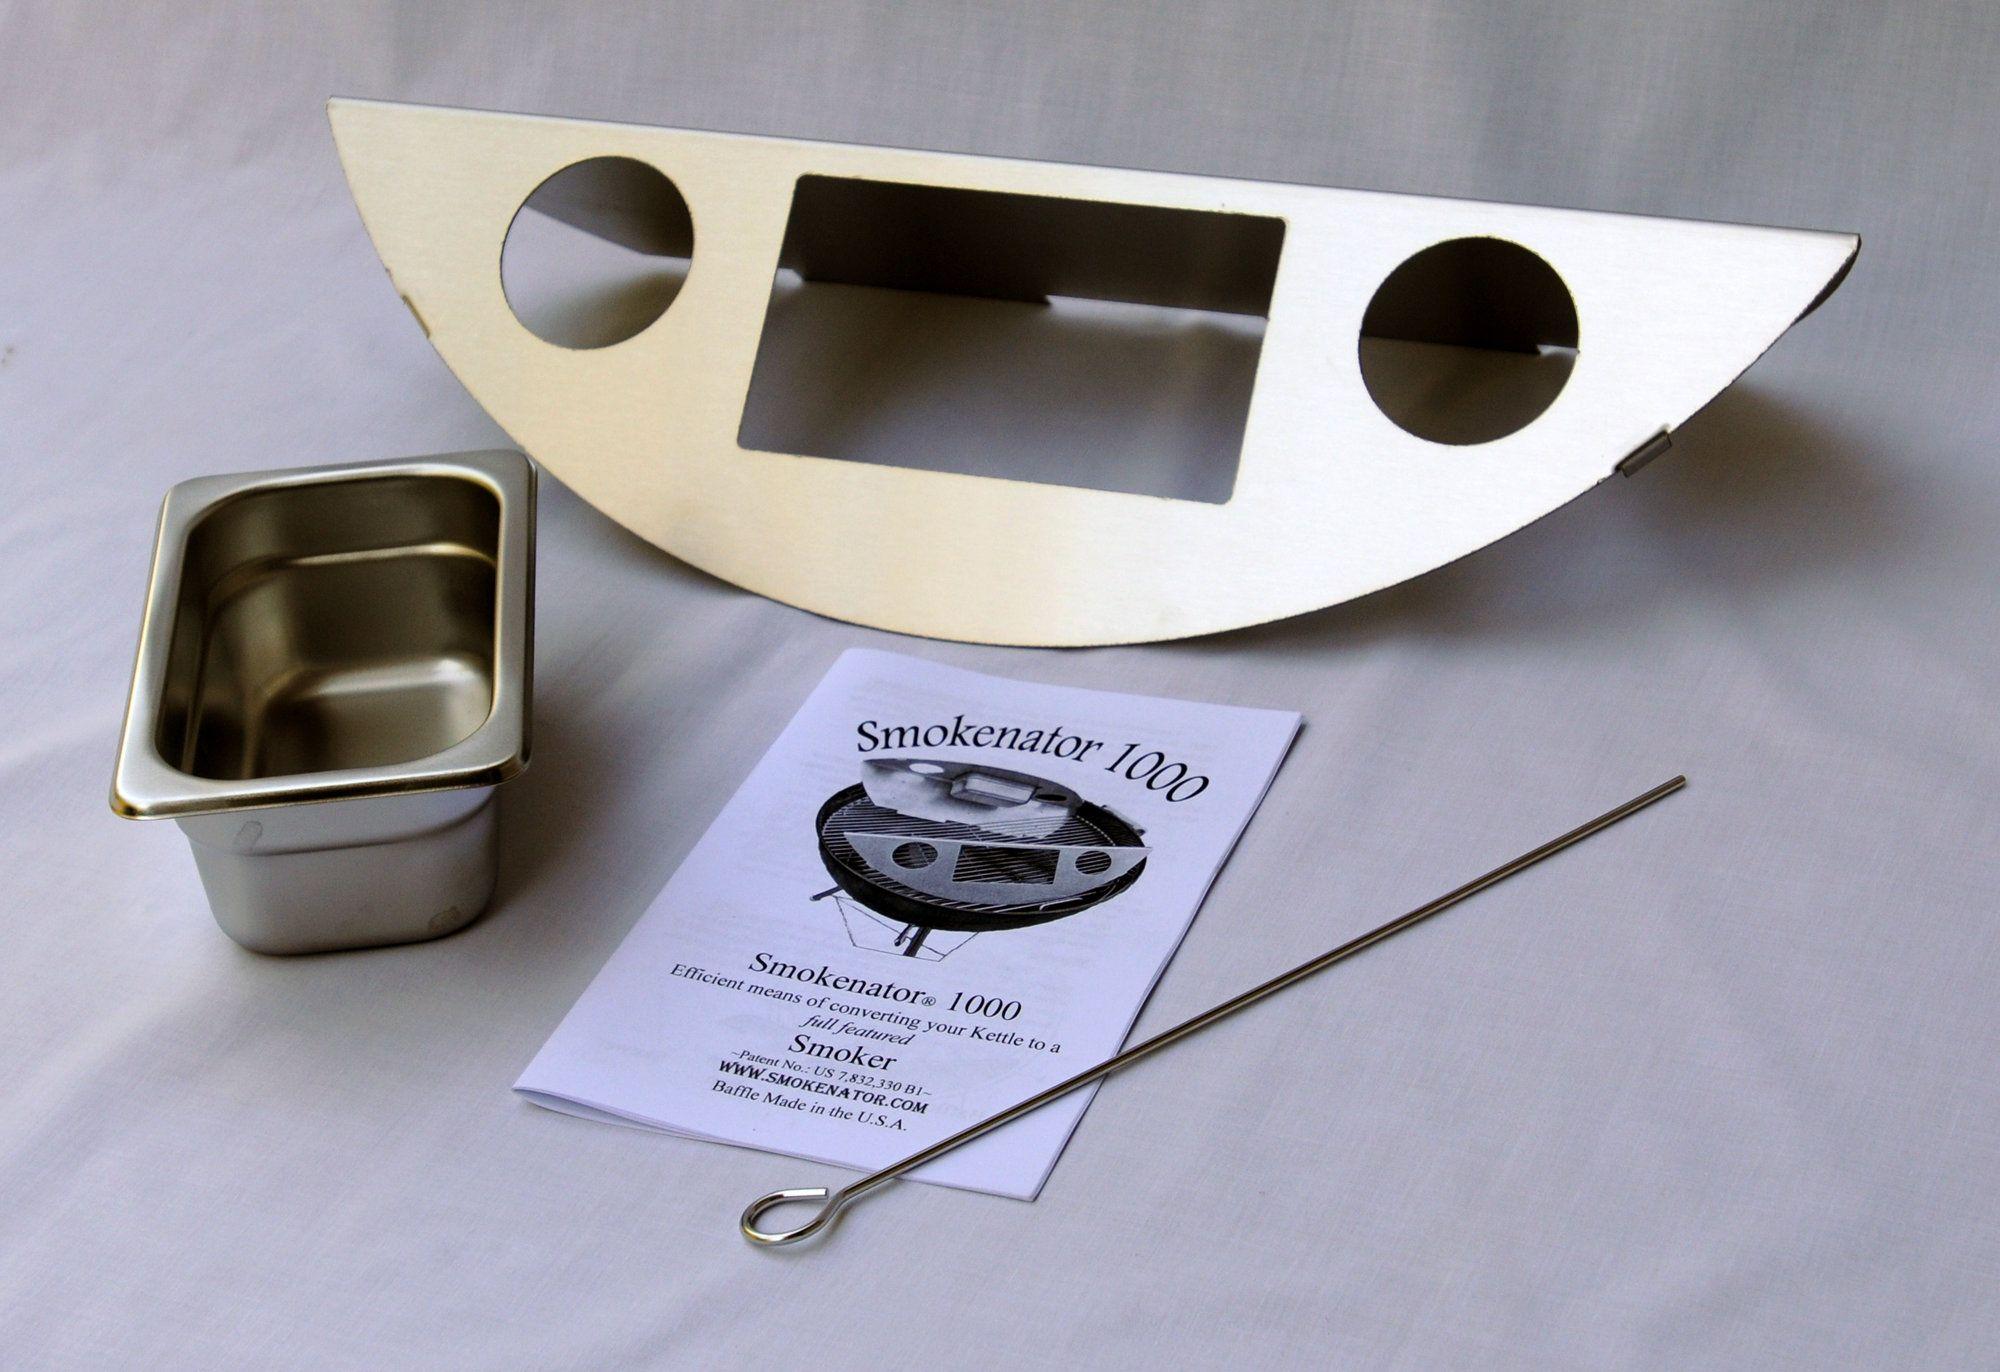 22 Smoker Box Kit For Weber Charcoal Grill Weber Charcoal Grill Meat Smoker Best Charcoal Grill